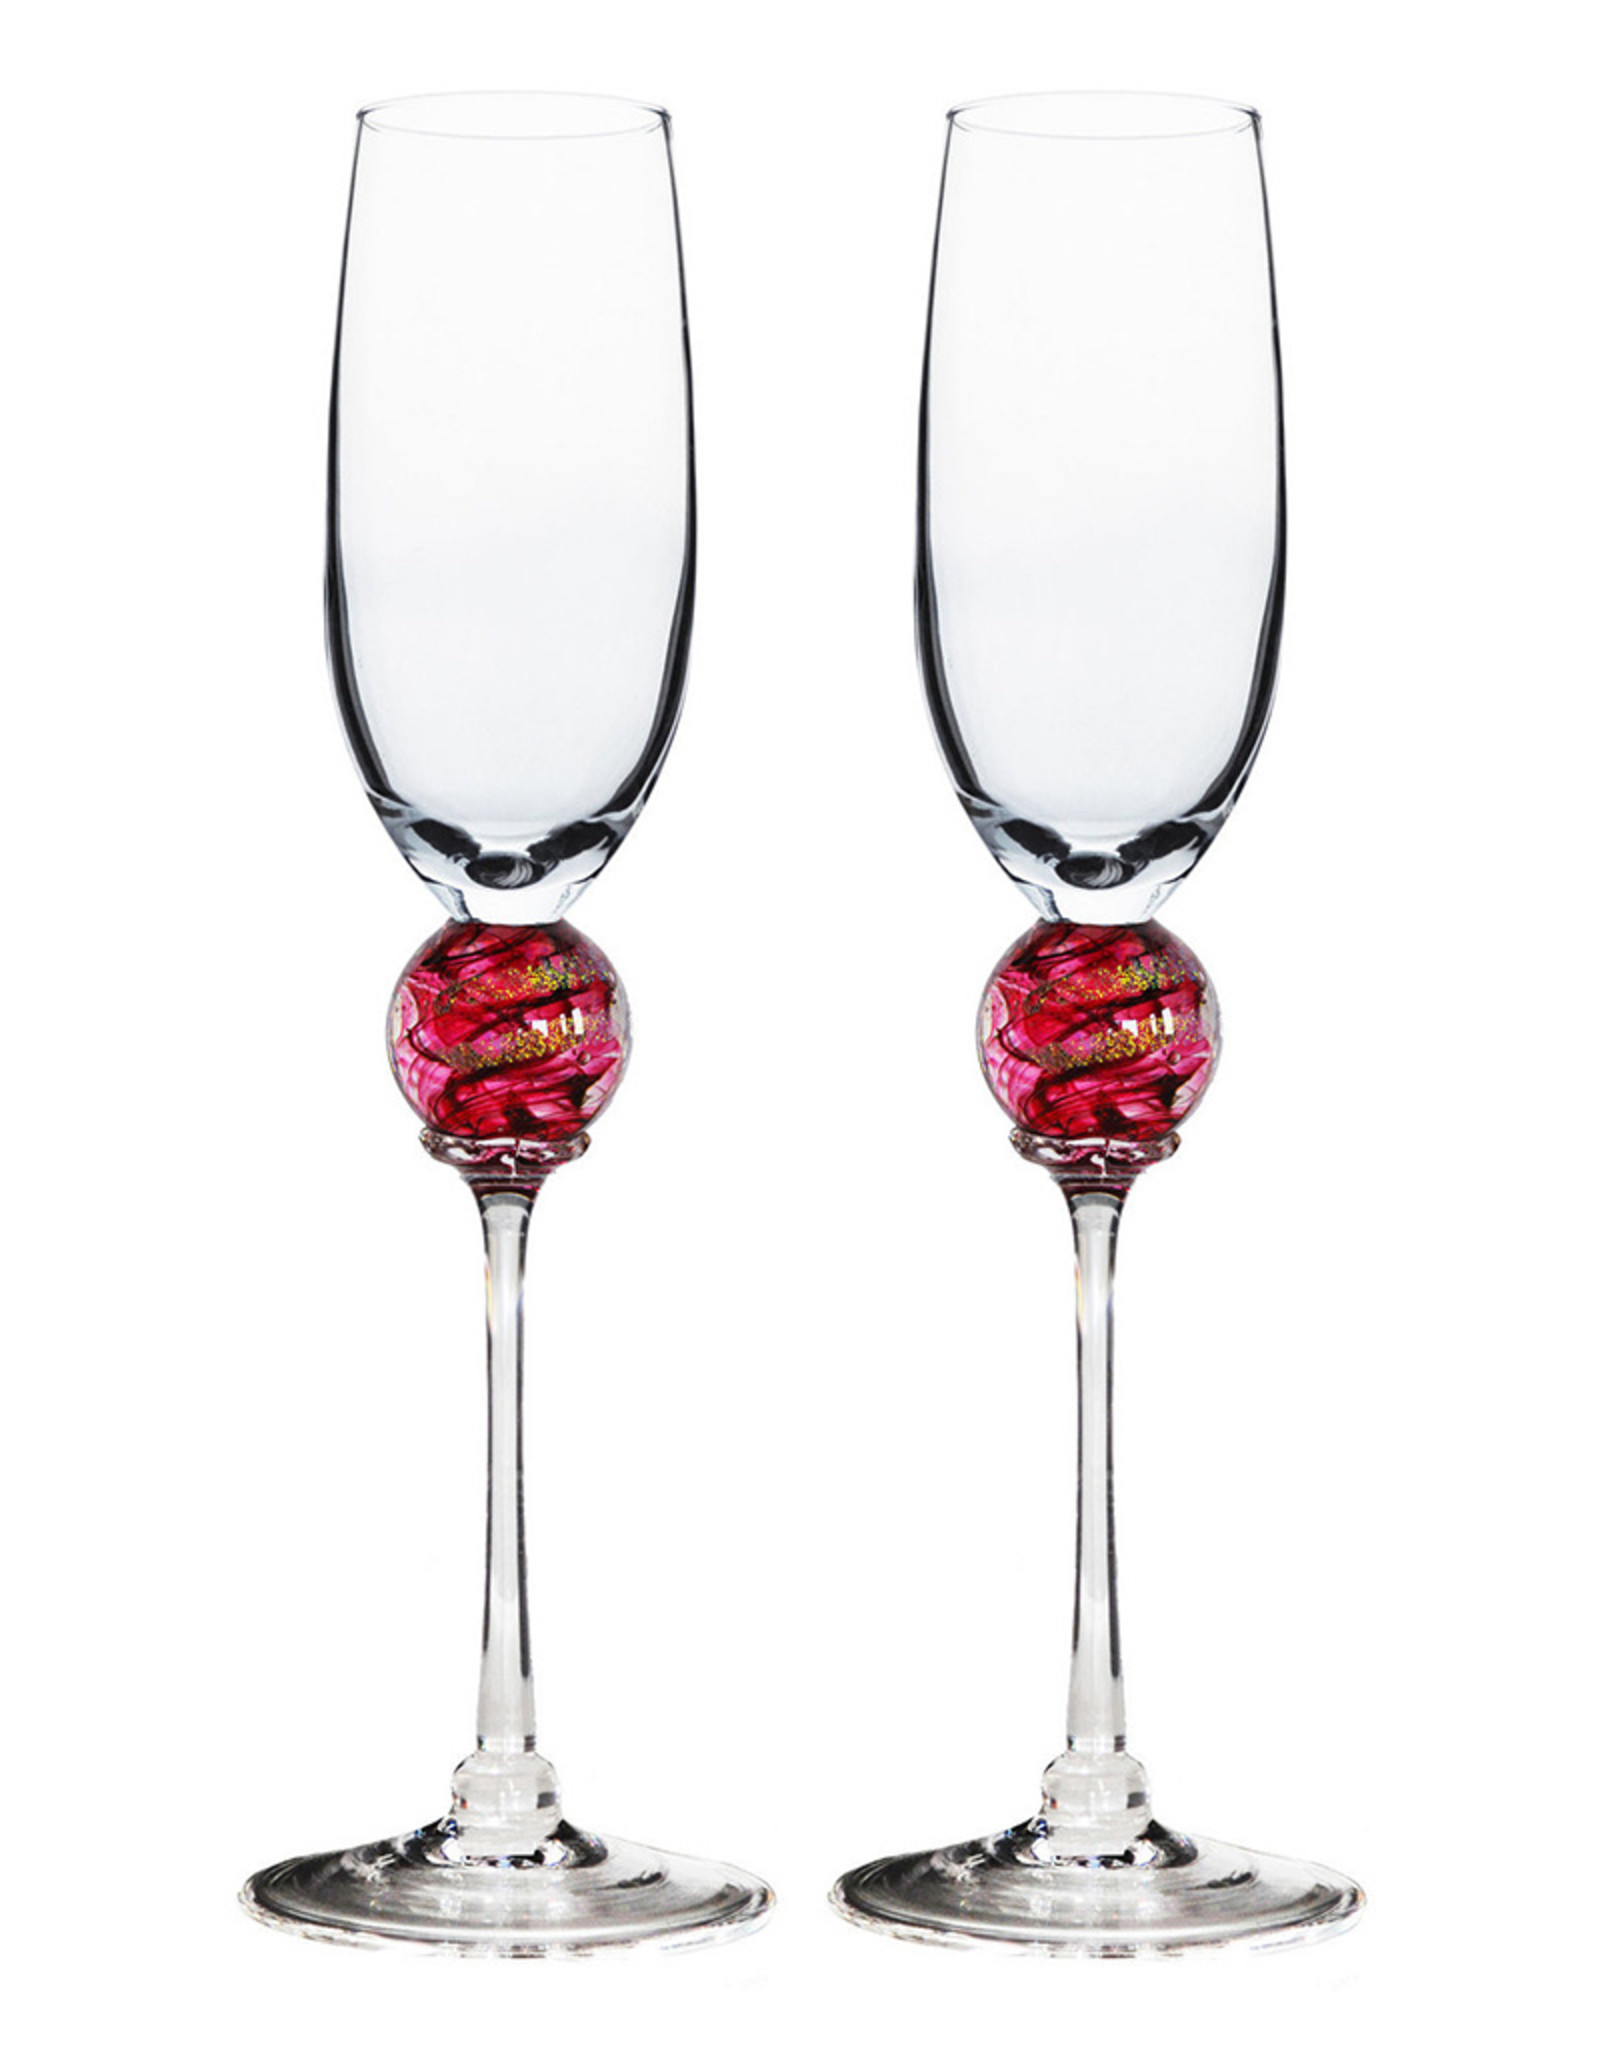 ROMEO GLASS RUBY PLANET FLUTE GLASS